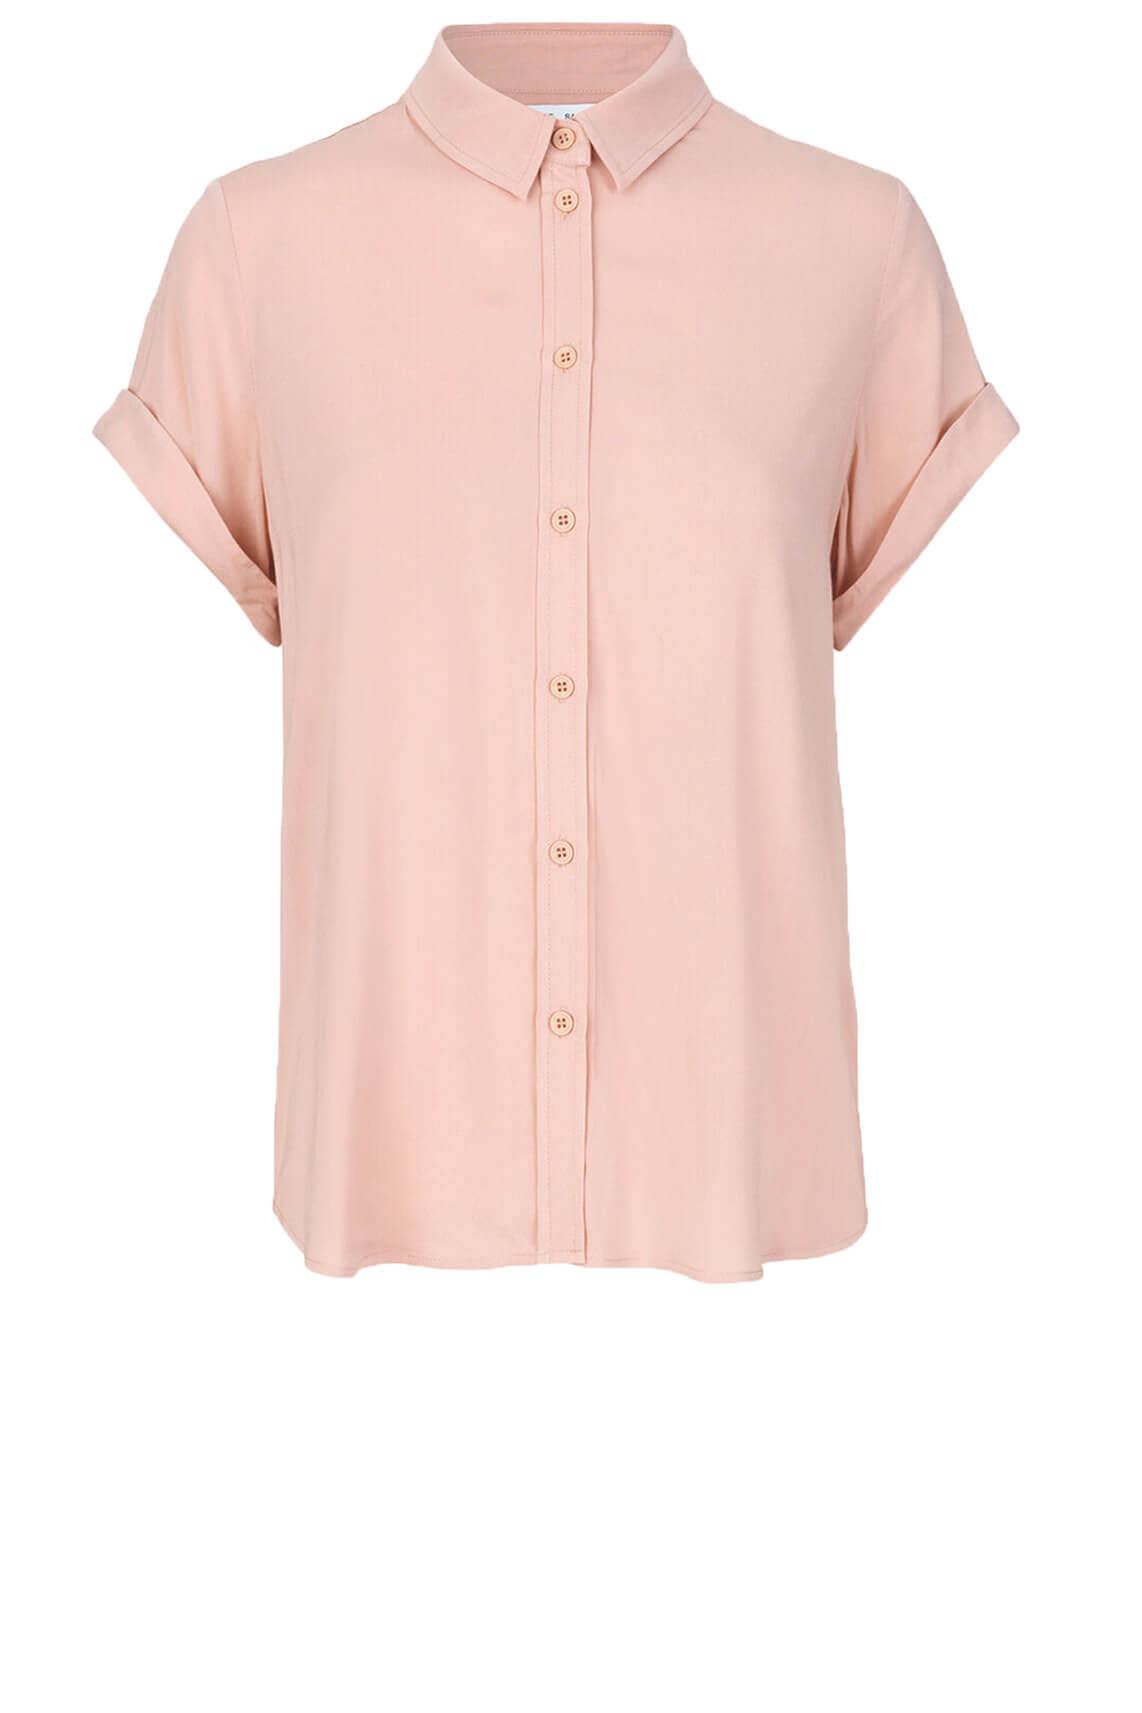 Samsoe Samsoe Dames Majan blouse roze